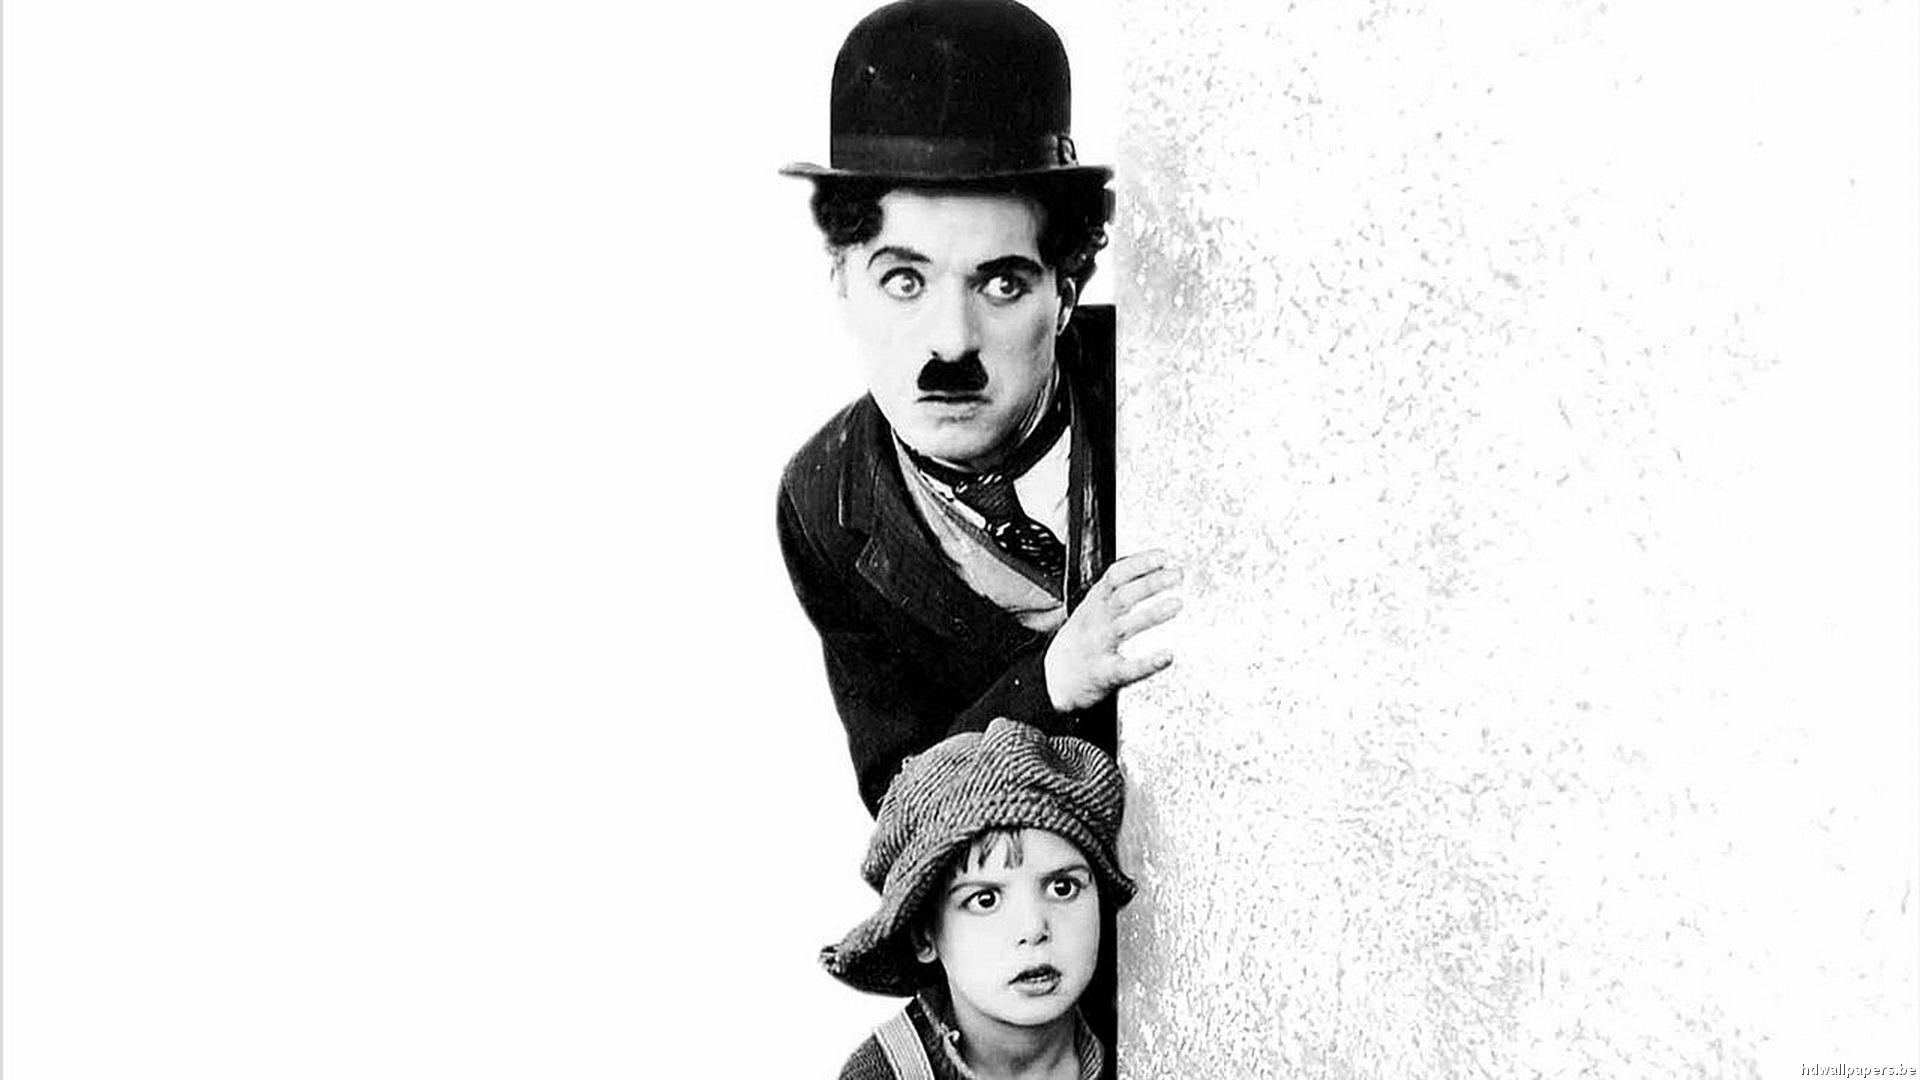 Charlie Chaplin Wallpaper 2jpg 1920x1080